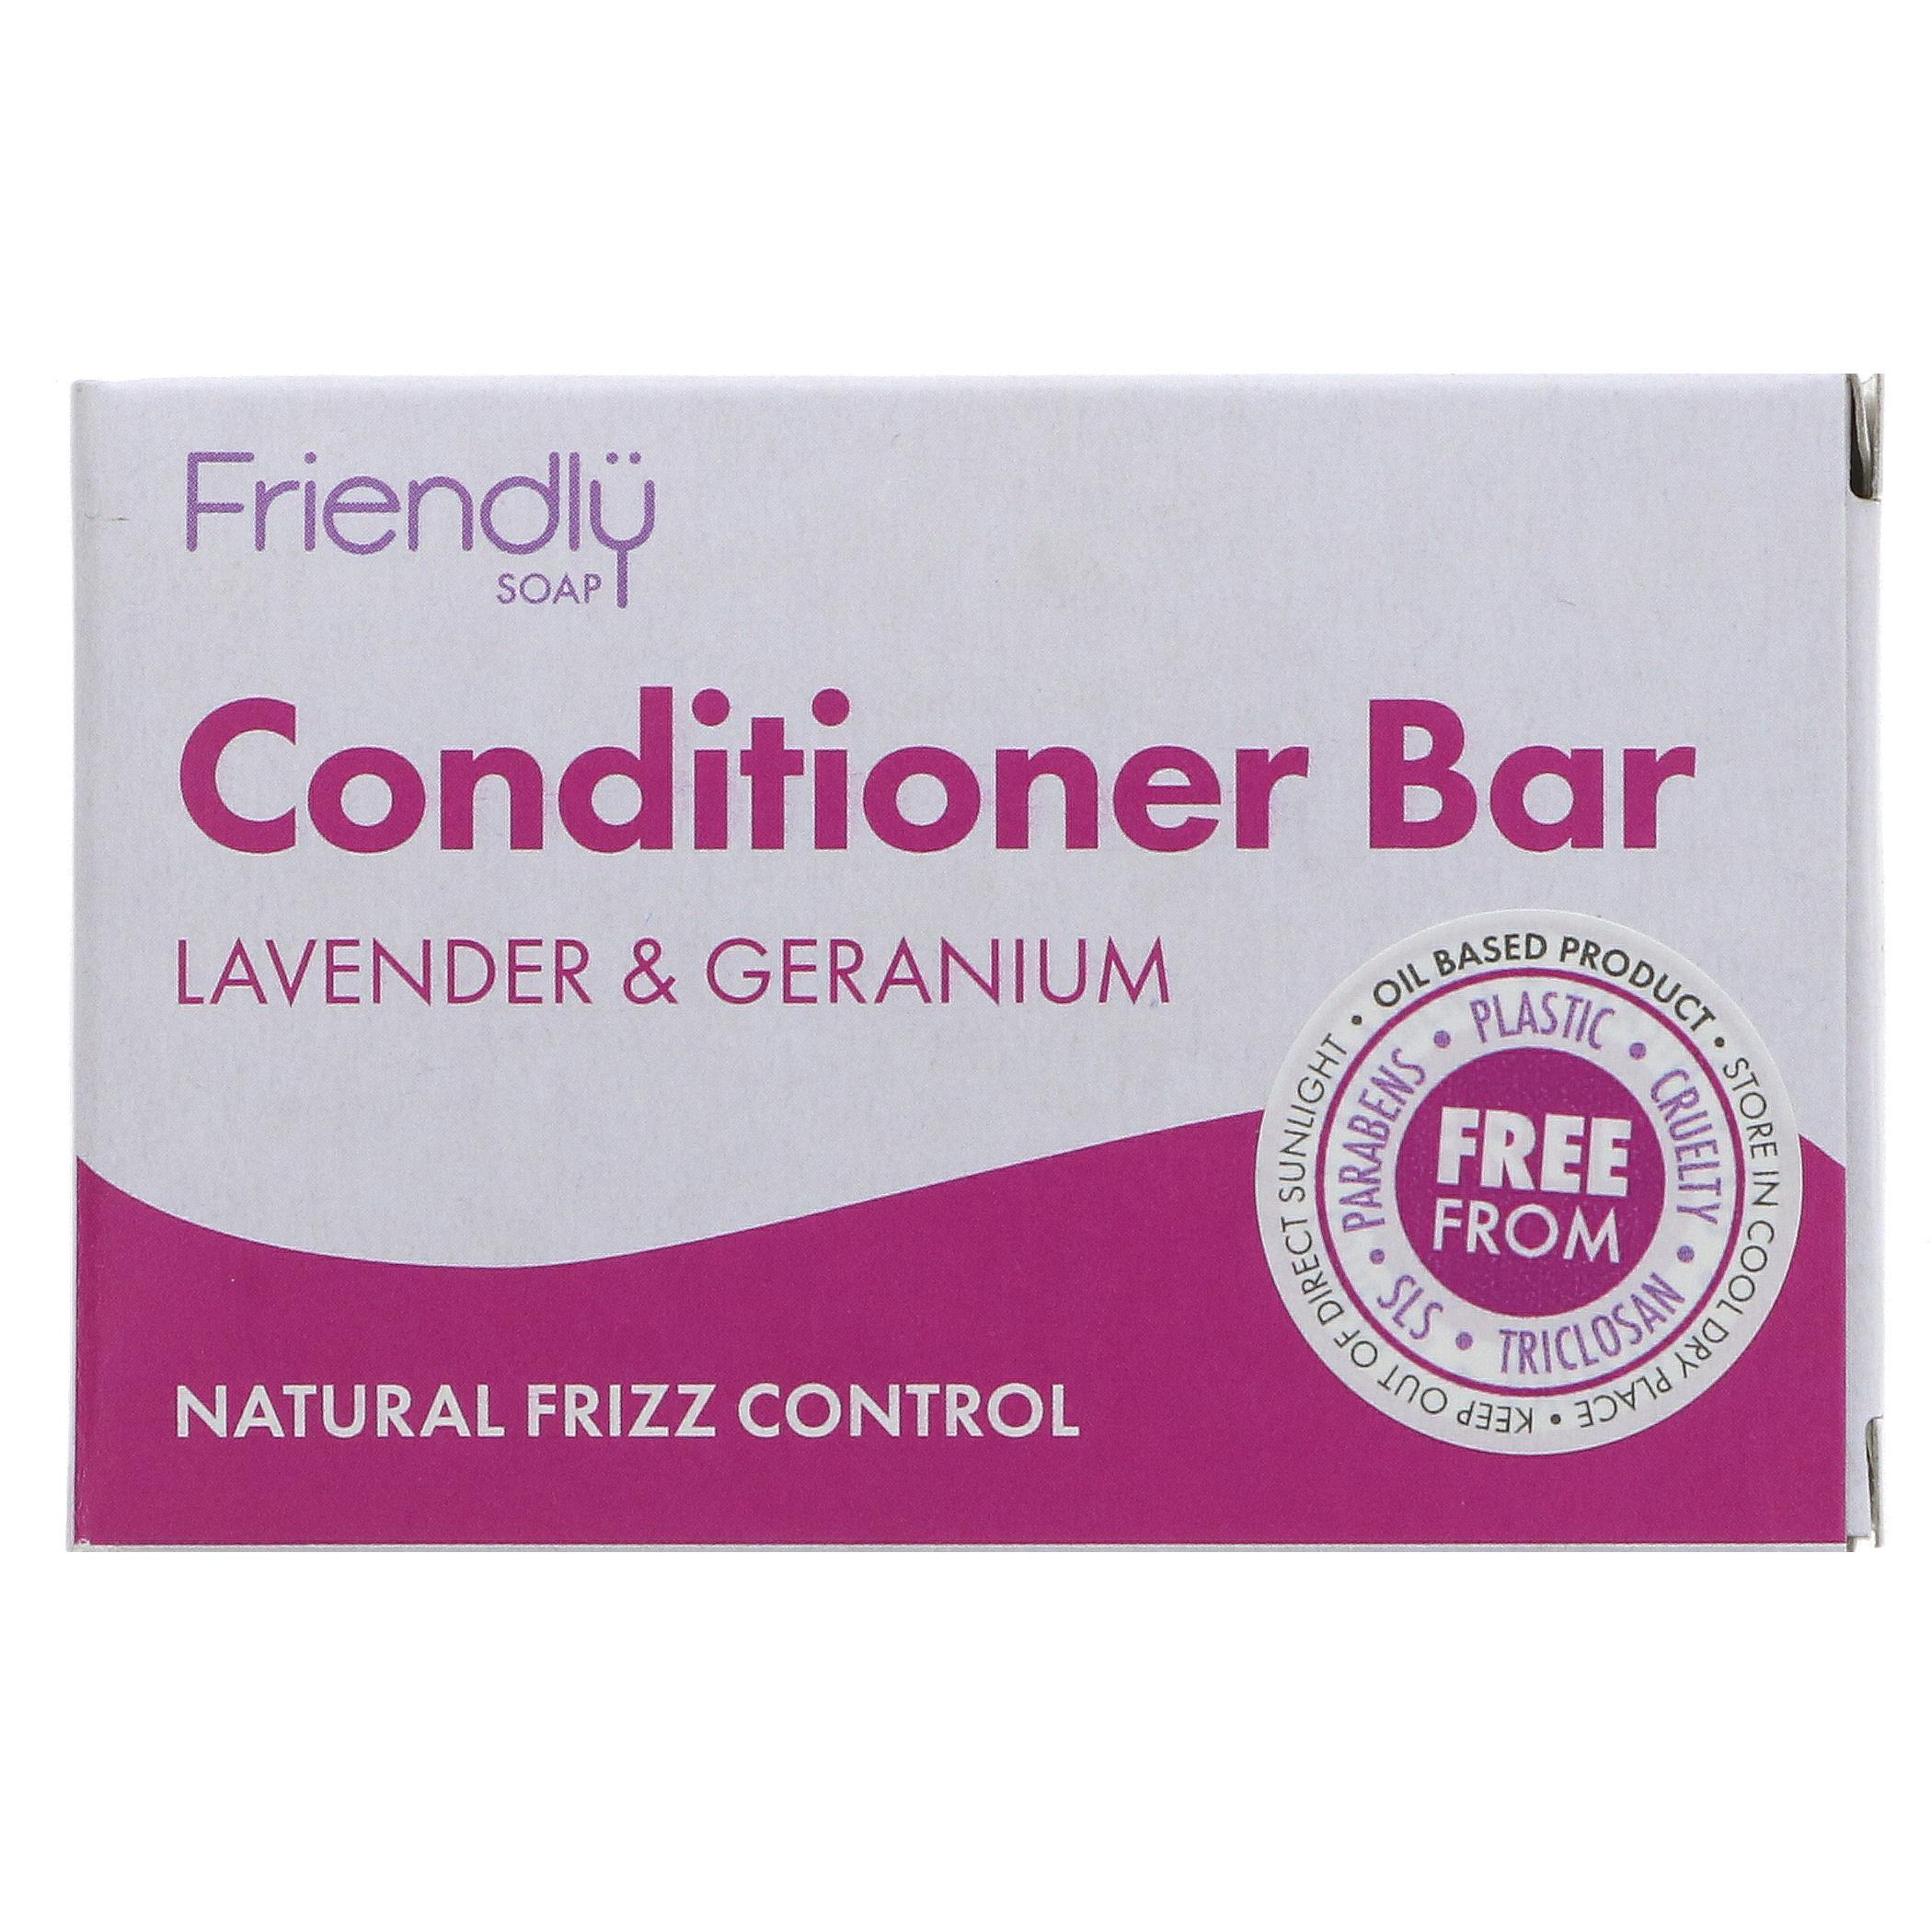 Friendly Conditioner Bars (95g)